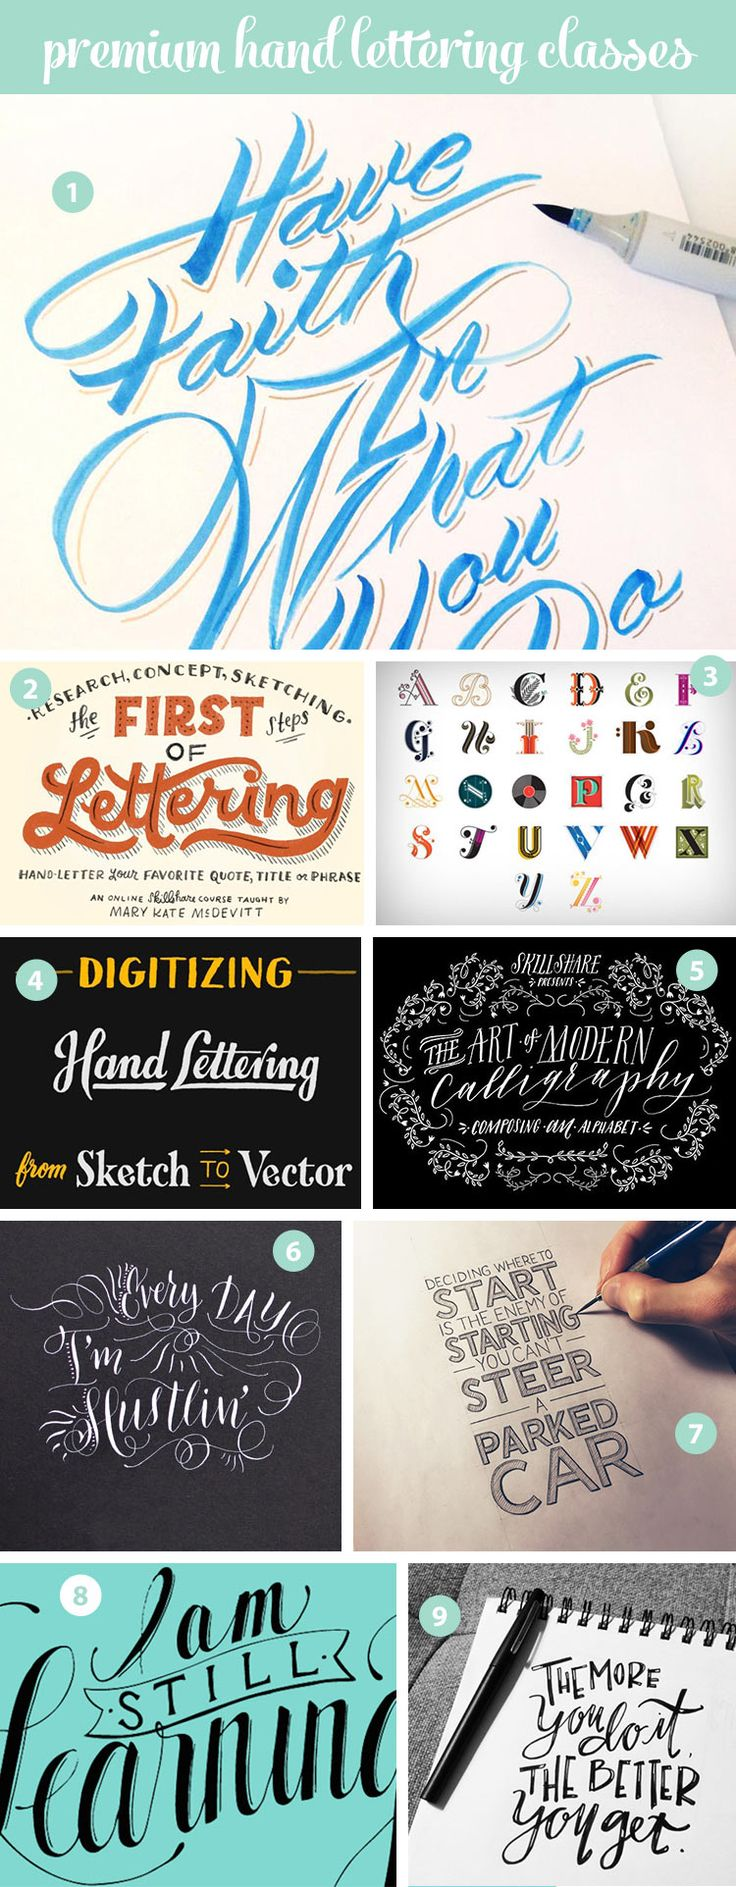 premium hand lettering online classes